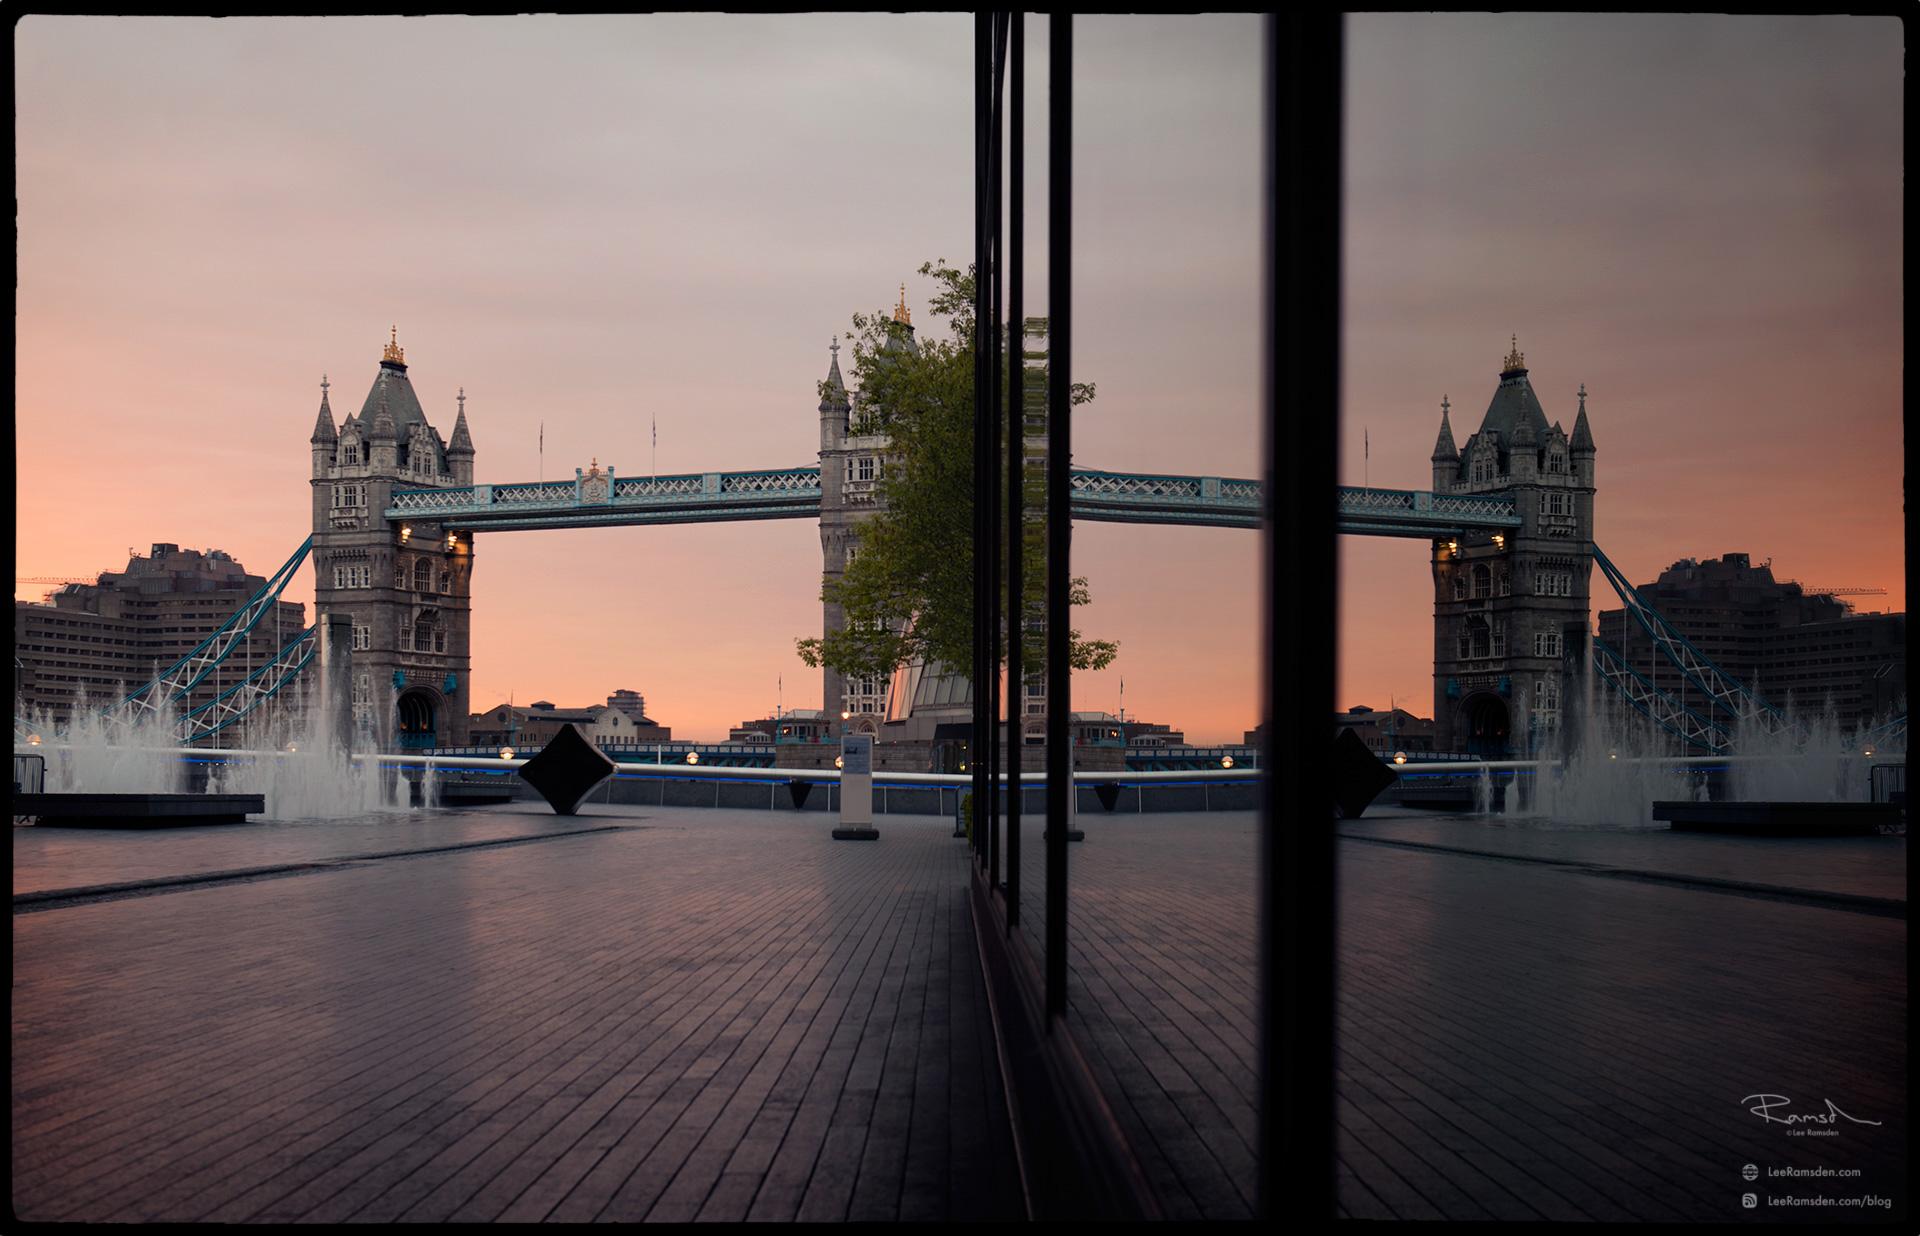 Tower bridge landmark famous world river Thames sunset sunrise moreLondon orange glow Lee Ramsden